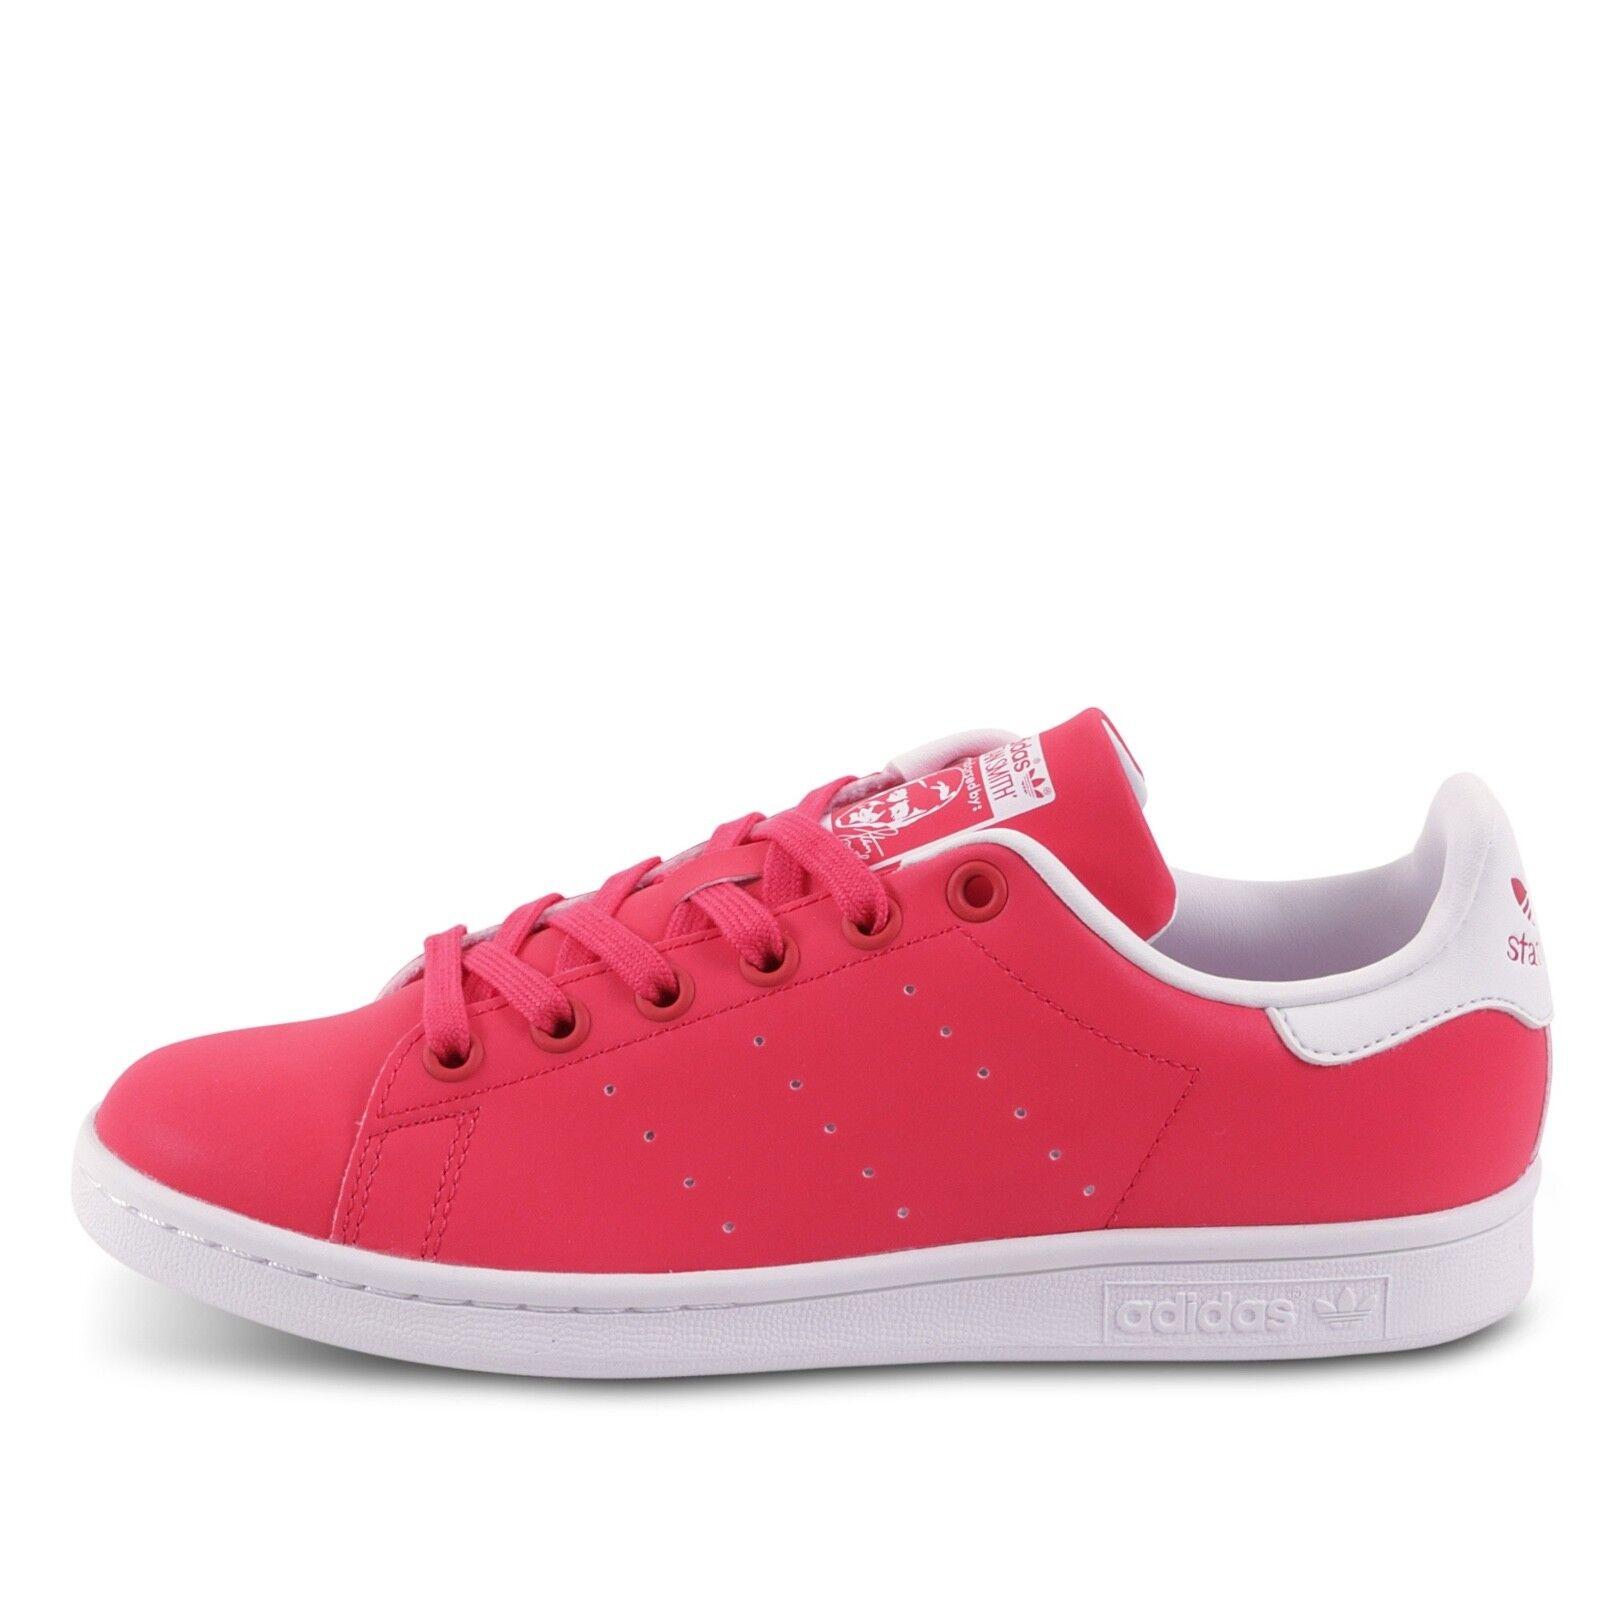 ADIDAS ORIGINALS STAN SMITH Damenschuhe'S Schuhe BB5154 SIZES UK4.5/6